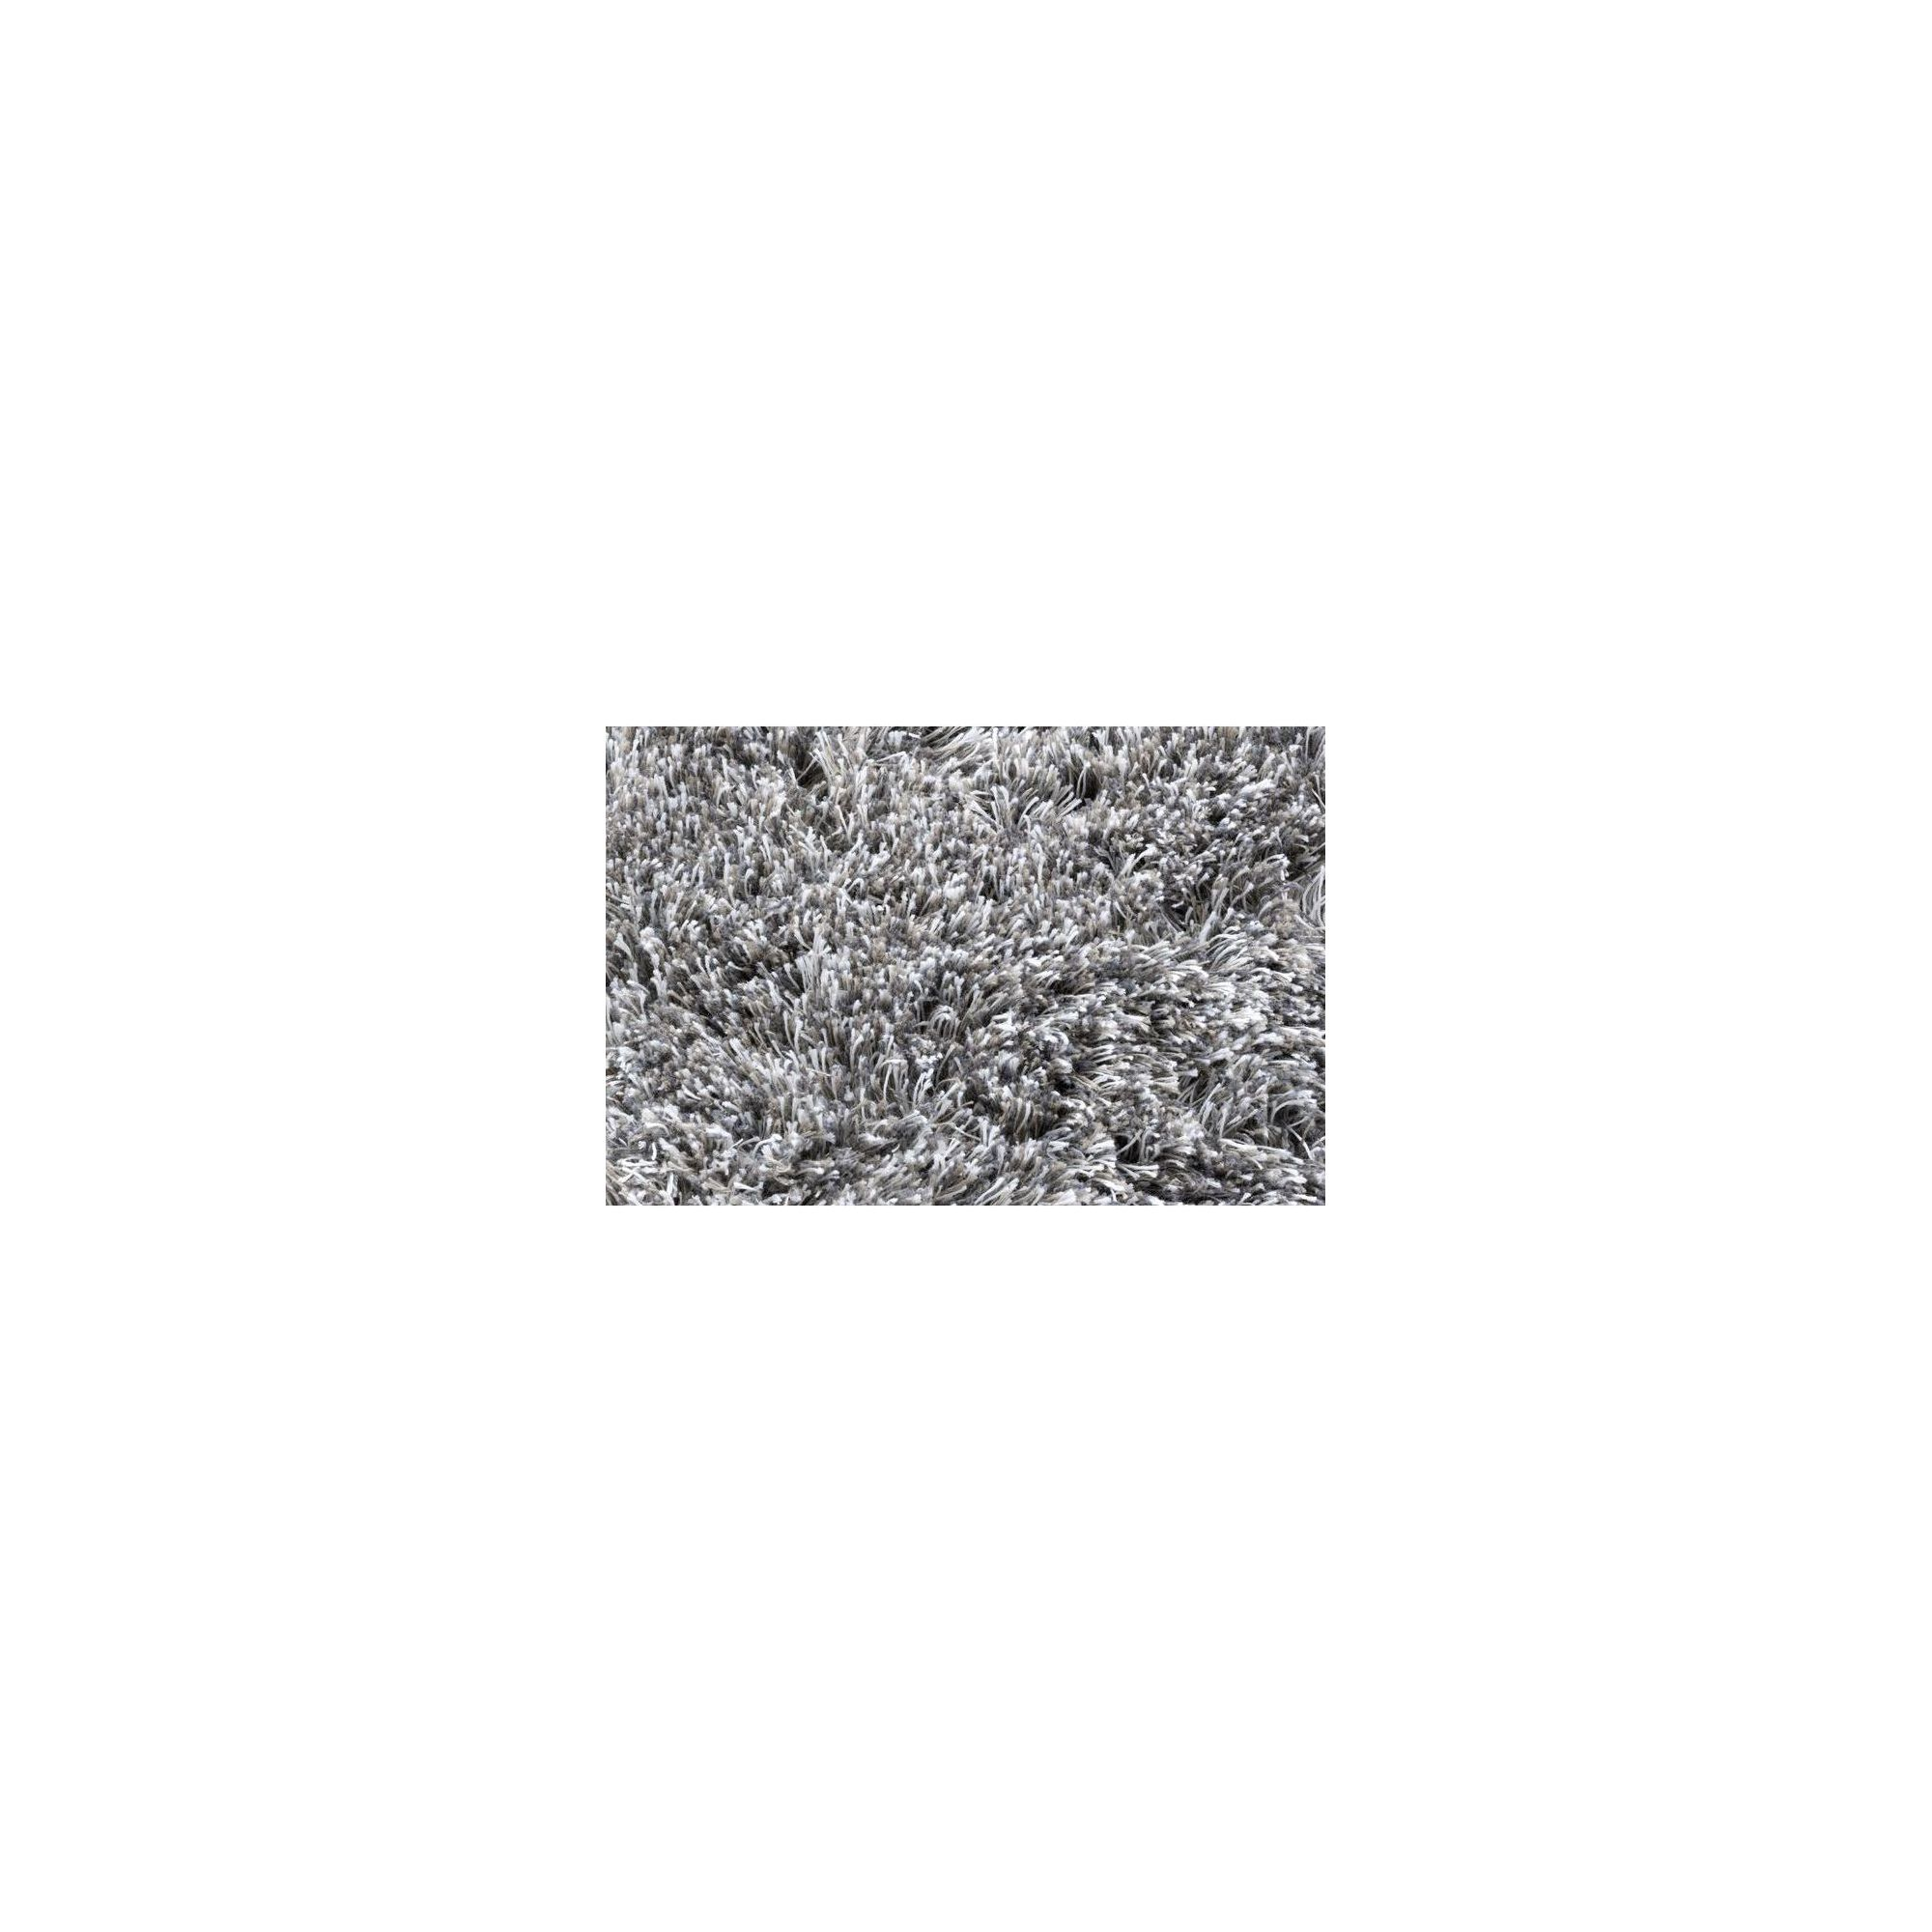 Linie Design Timeless Stone Shag Rug - 300cm x 200cm at Tesco Direct